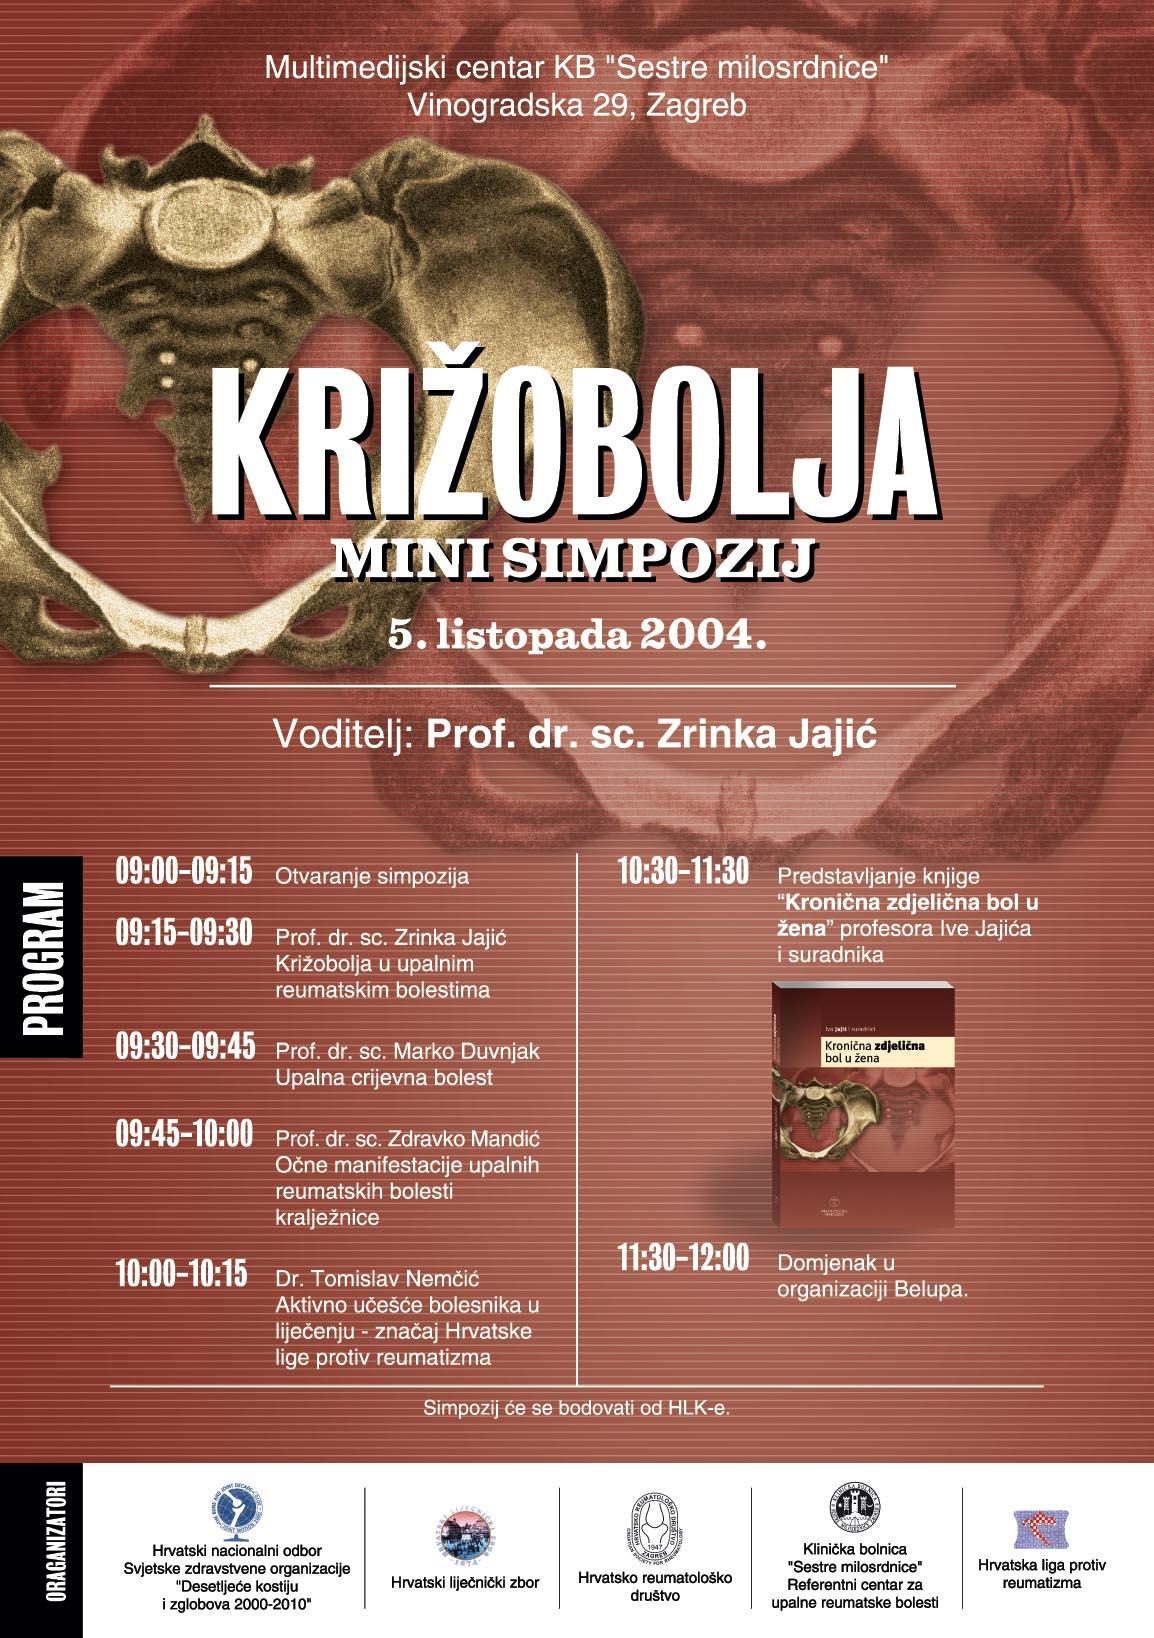 Croatian scientific bibliography - List of papers